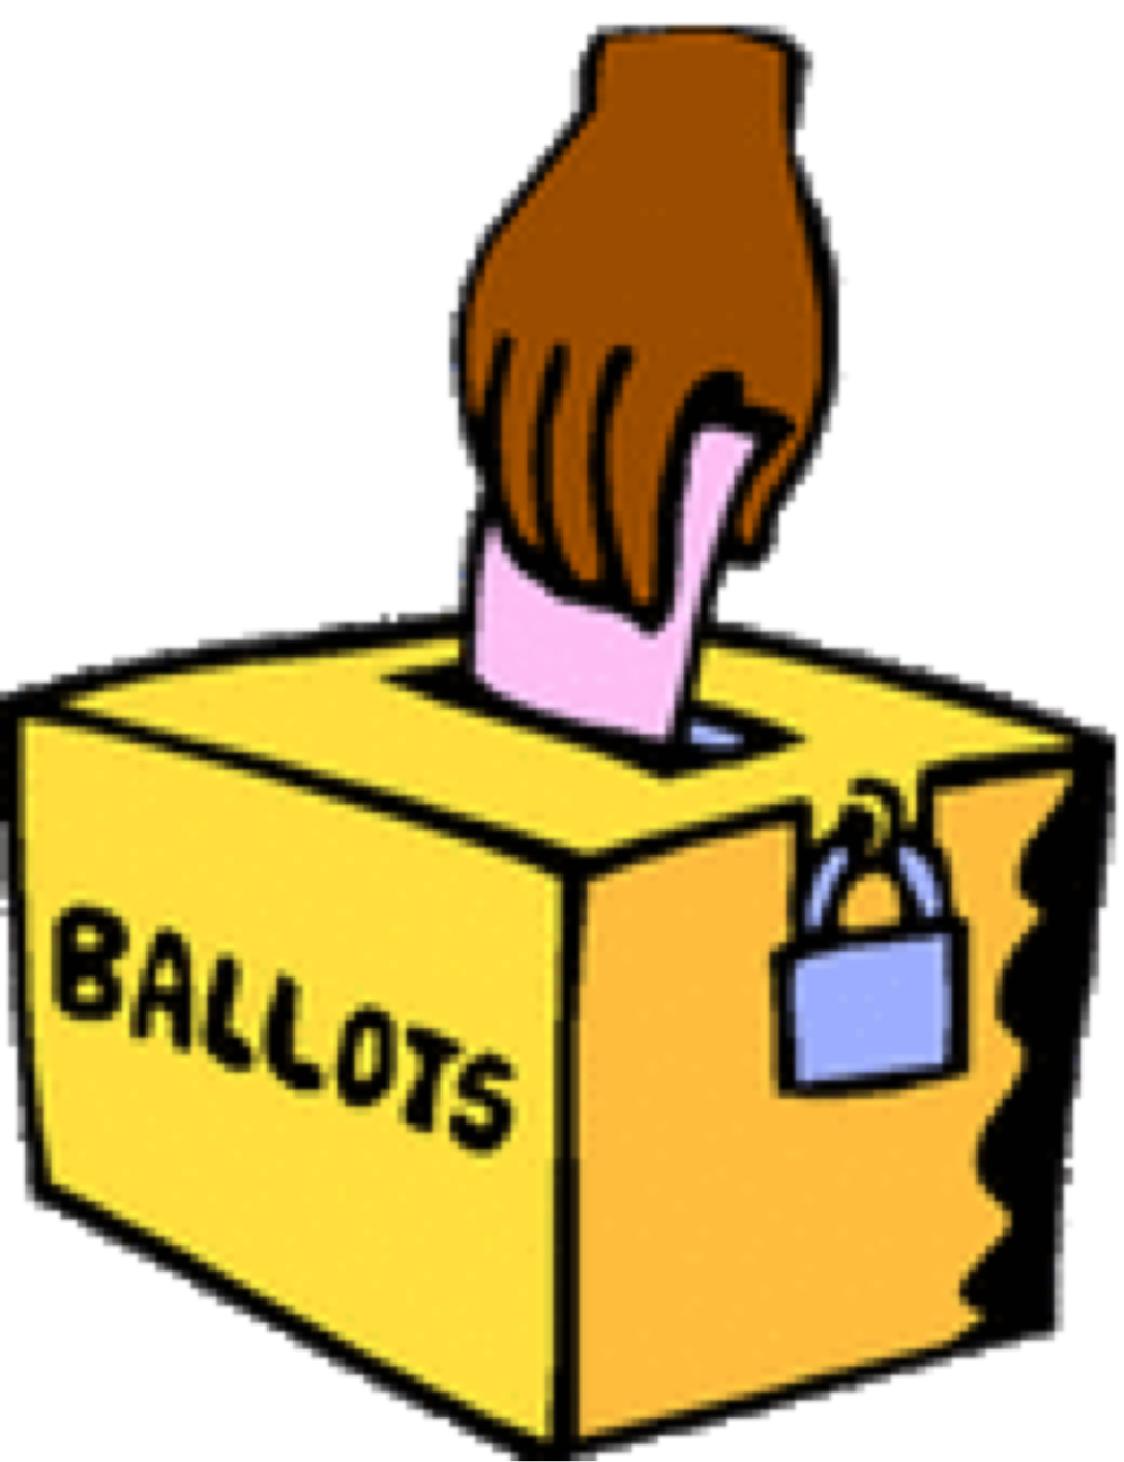 Amendment 15 by Ji Woo Hwang.